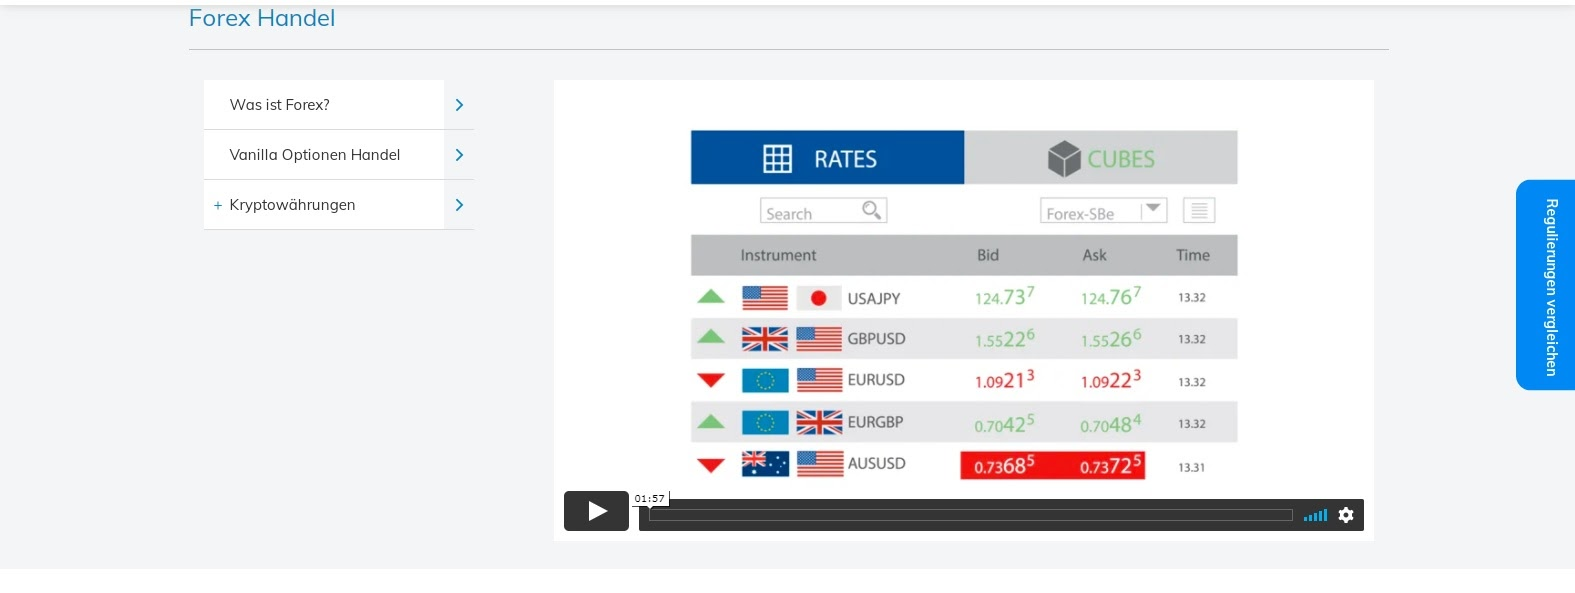 Trading AvaTrade Forex